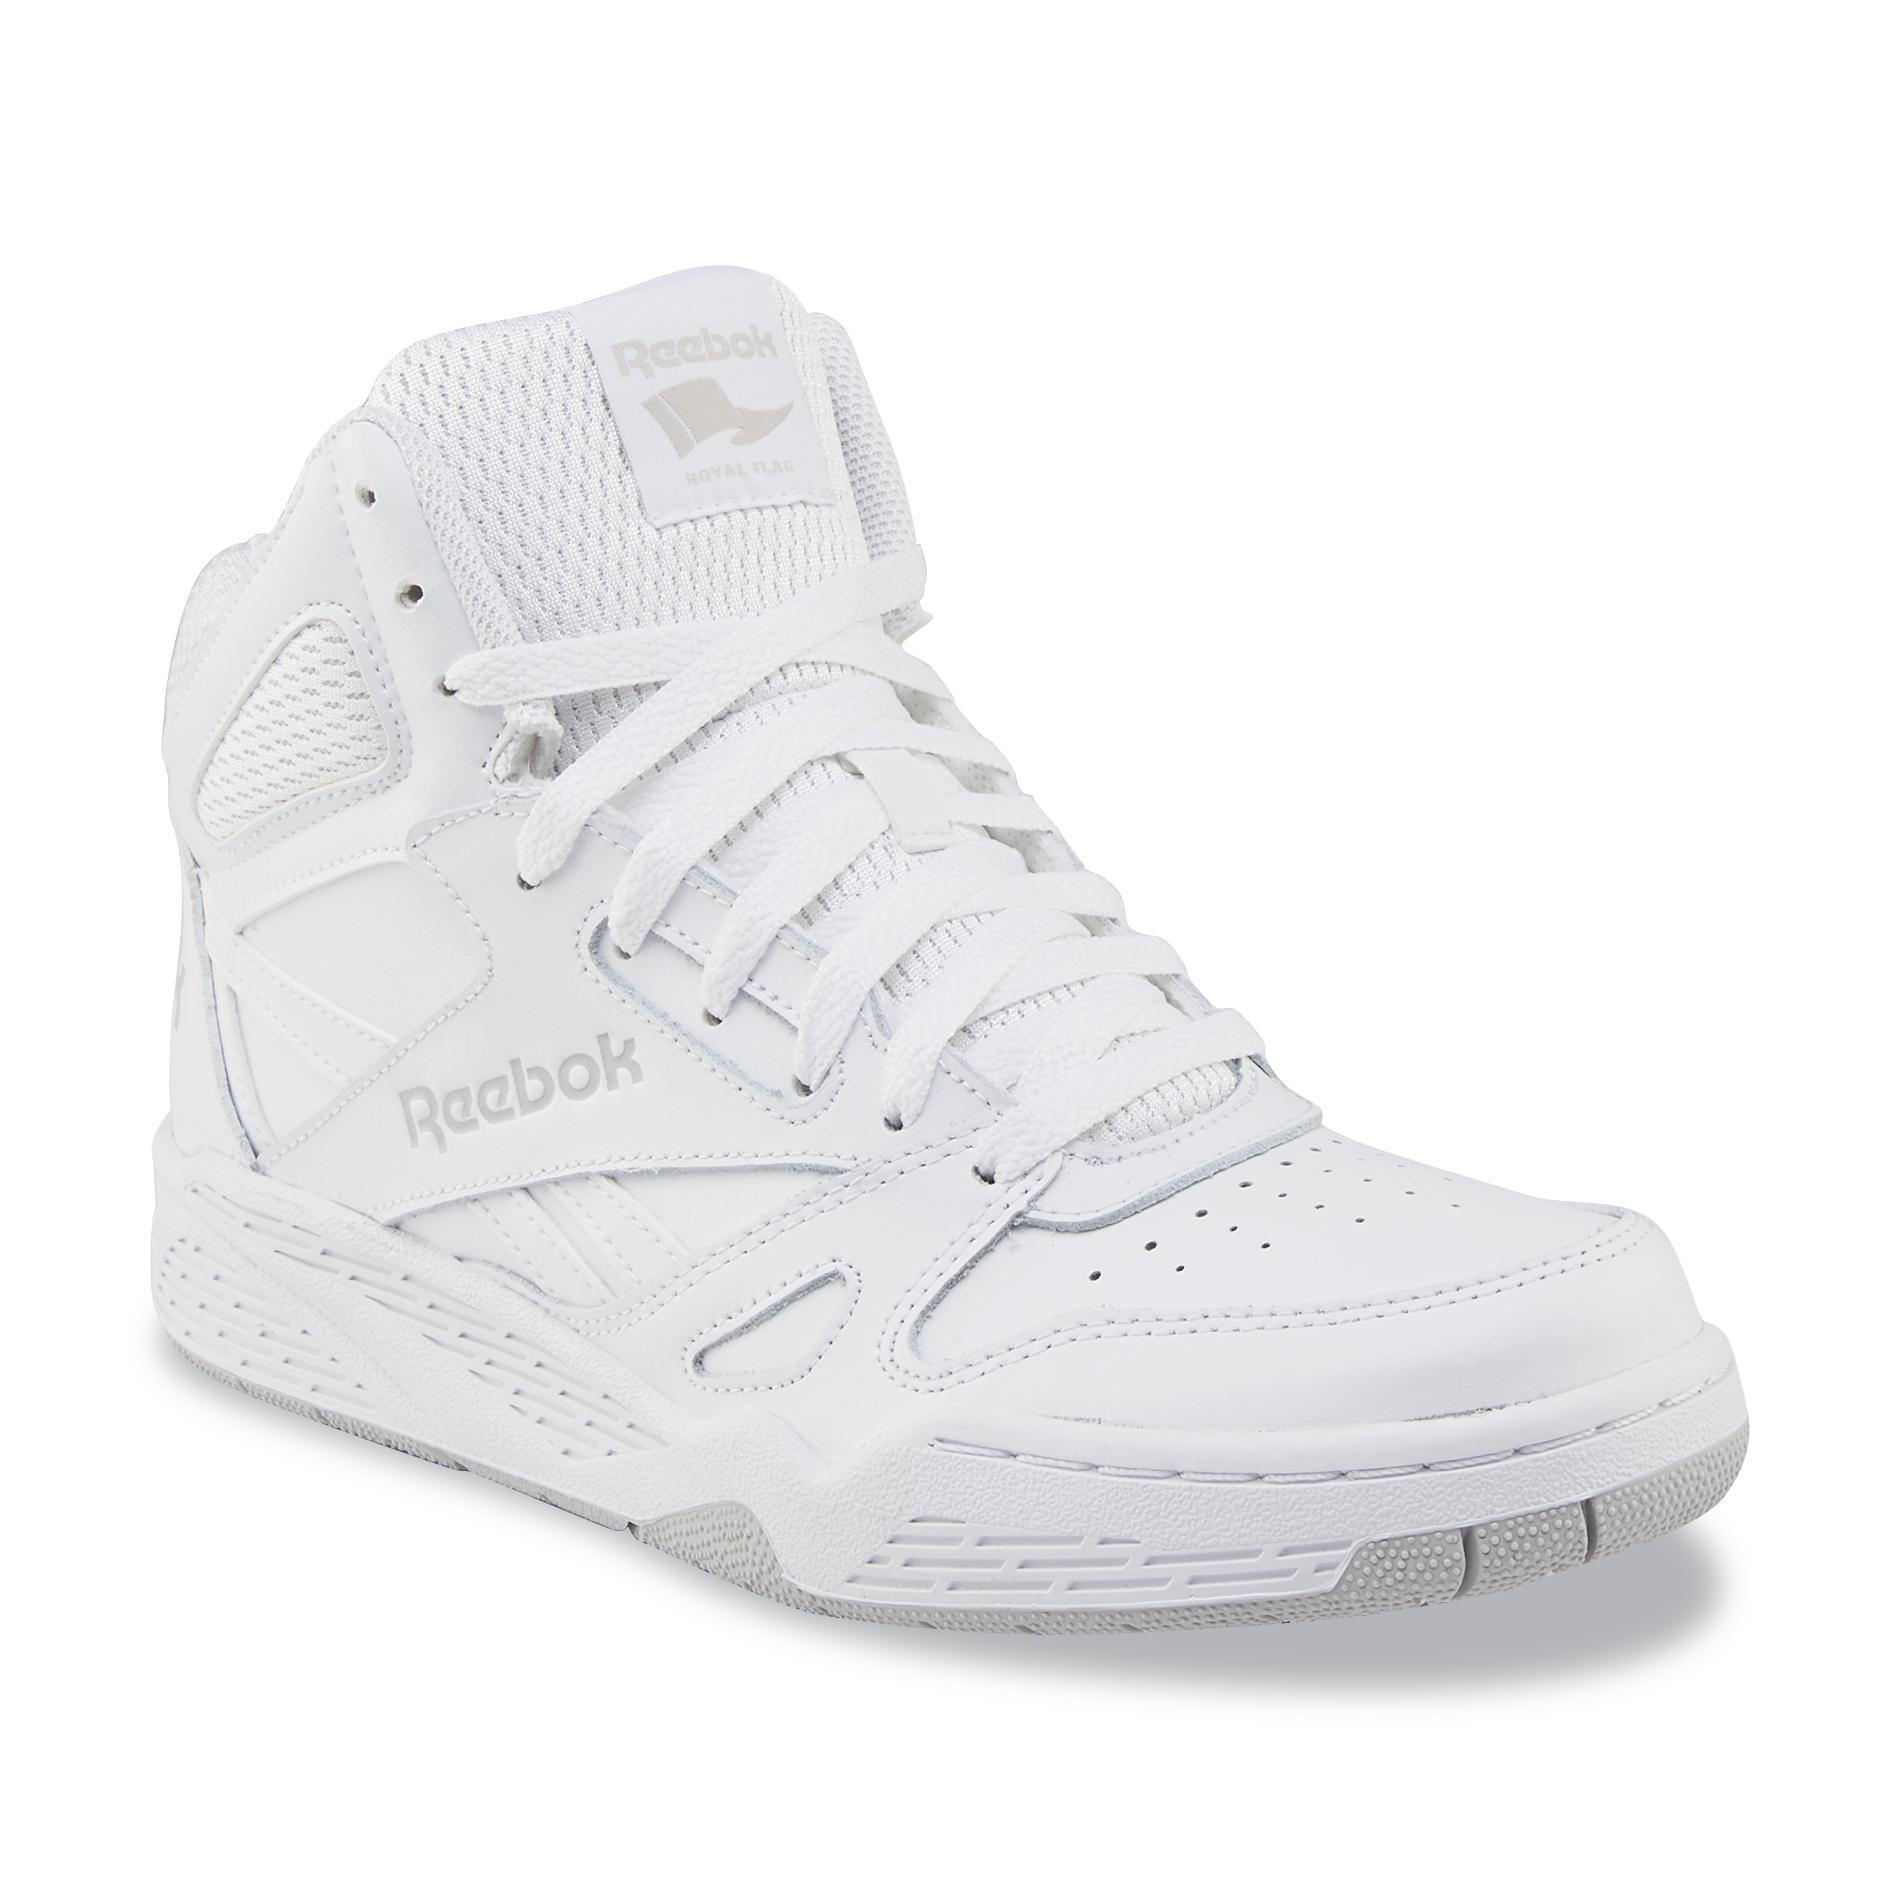 reebok high tops reebok reebok menu0027s royal bb4500 high-top leather basketball shoe - white RHRPFQS